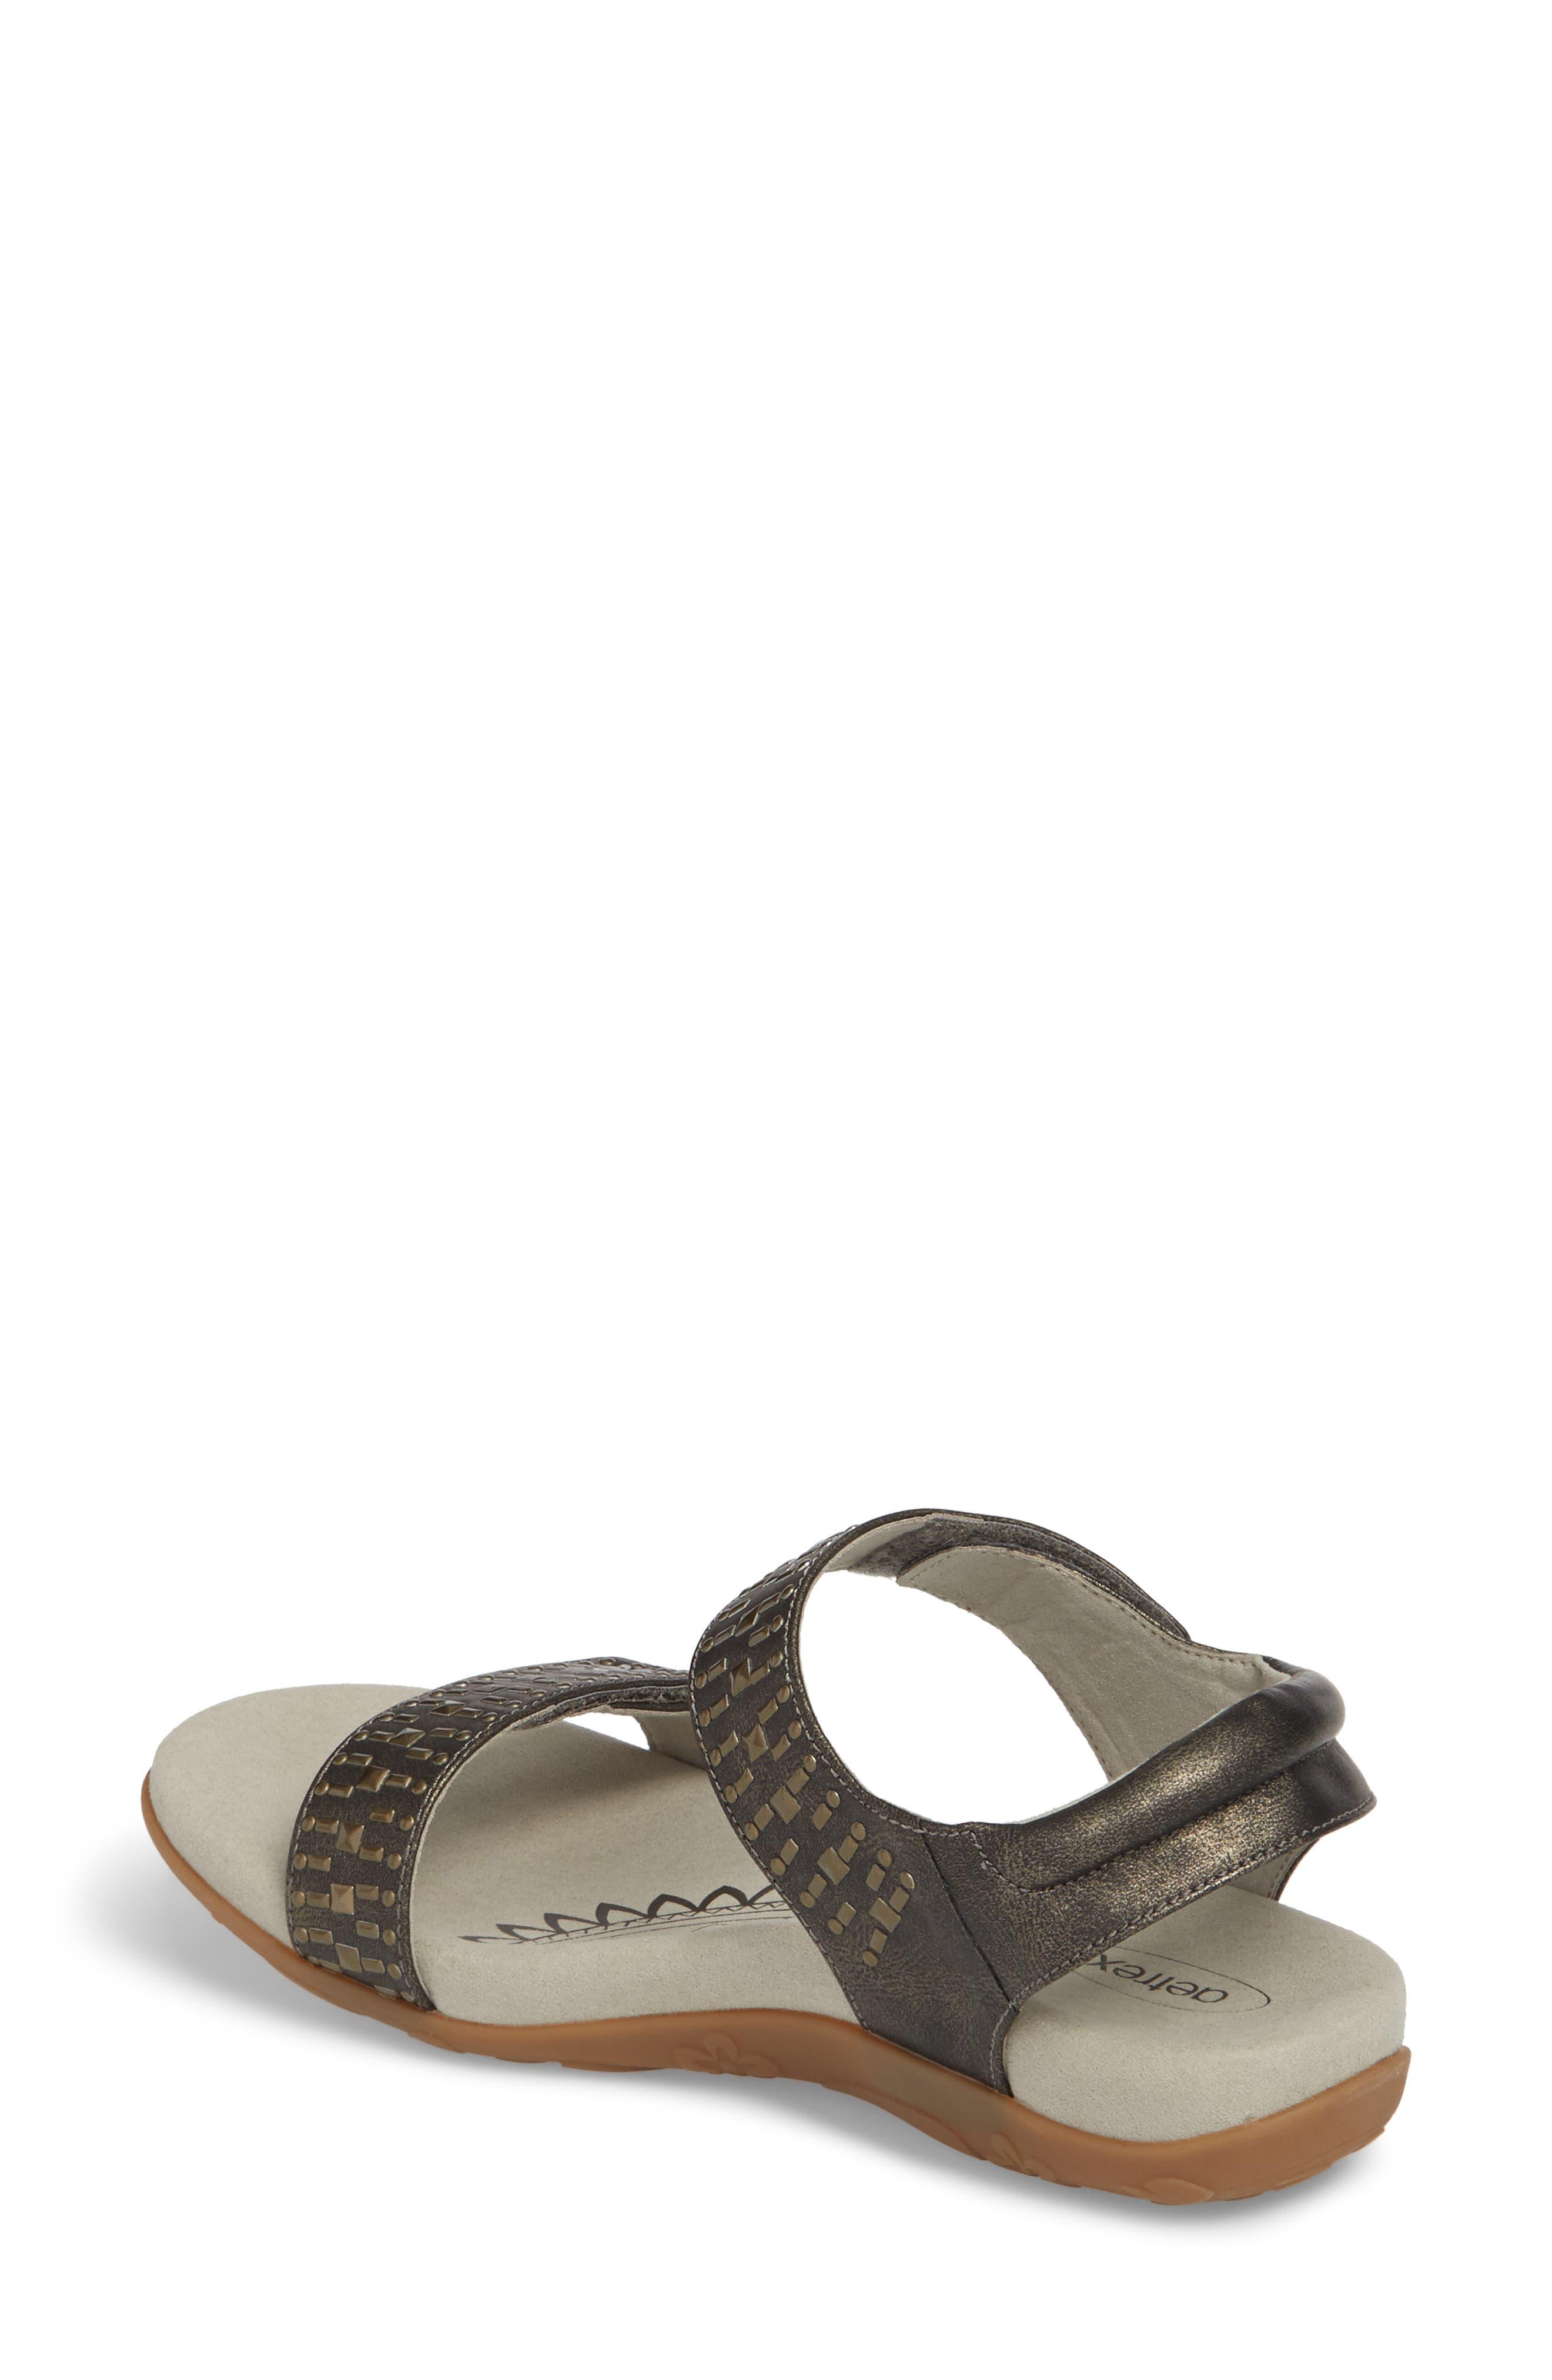 'Maria' Sandal,                             Alternate thumbnail 2, color,                             Pewter Leather